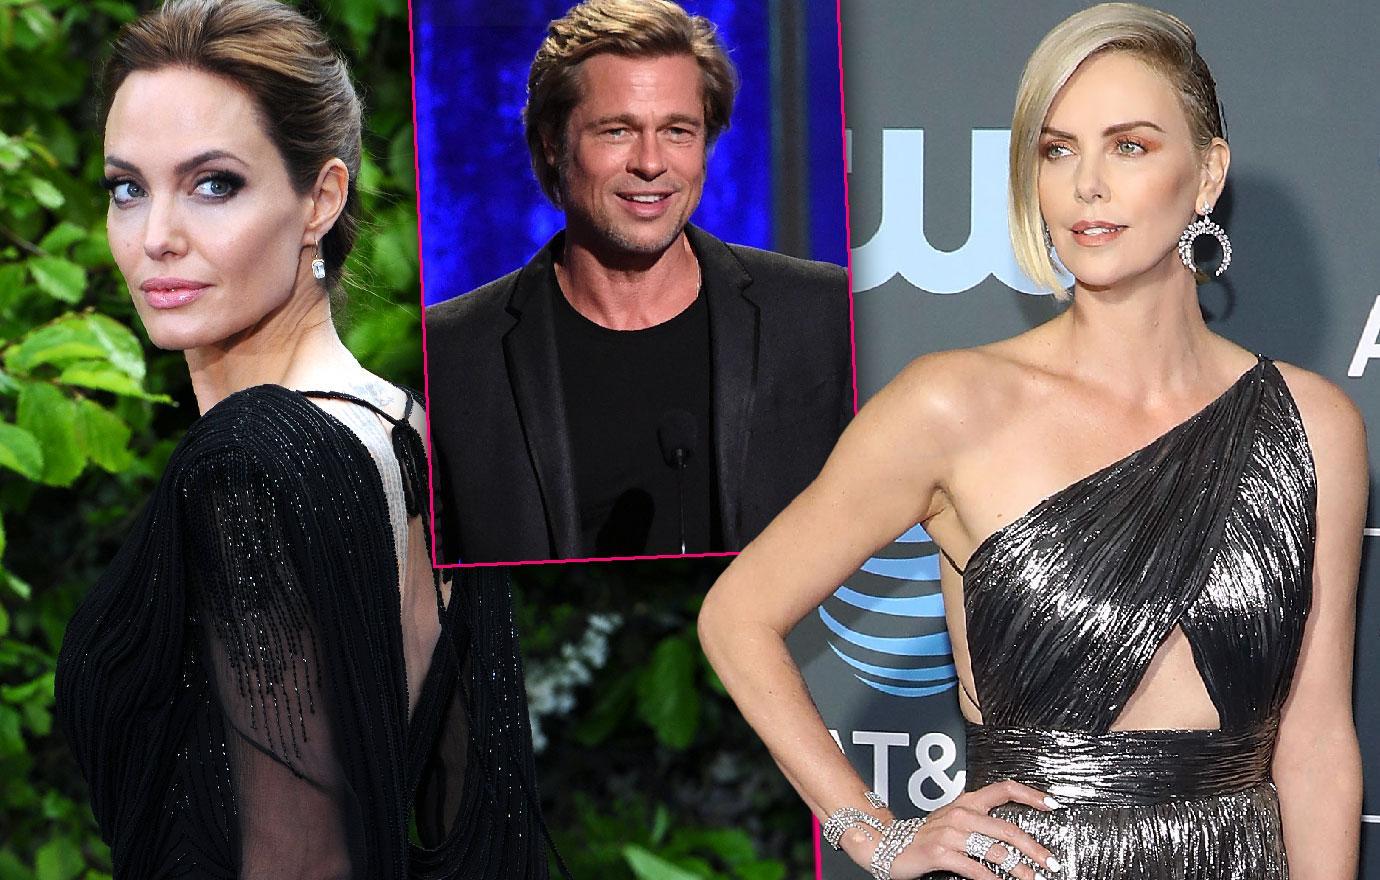 Brad Pitt New Love Charlize Theron Feud With Angelina Jolie